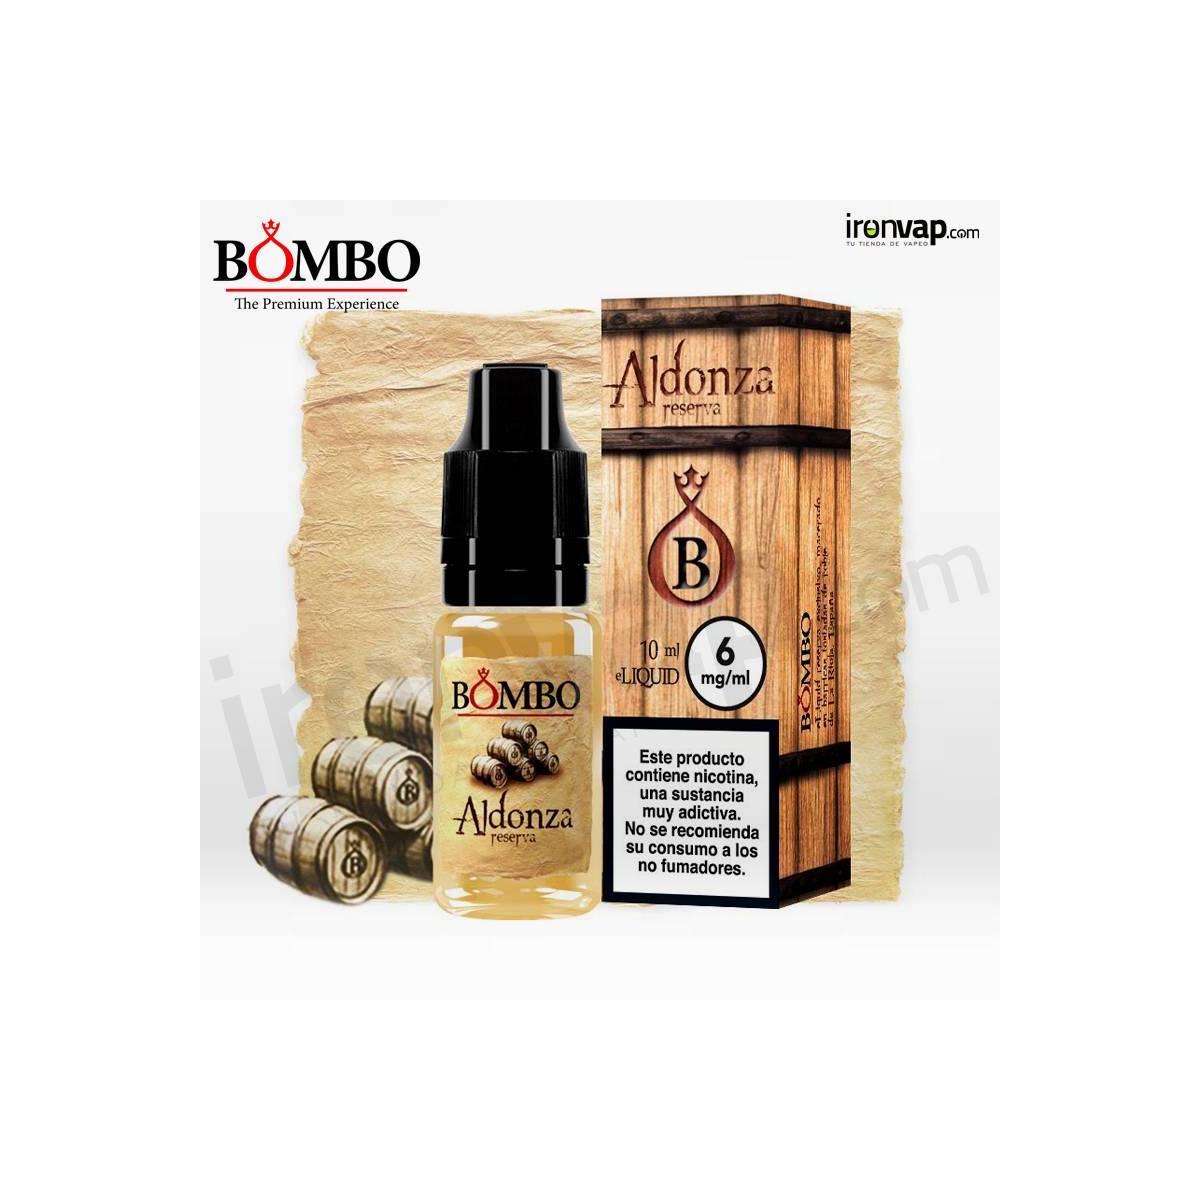 Aldonza Reserva 10ml - Bombo